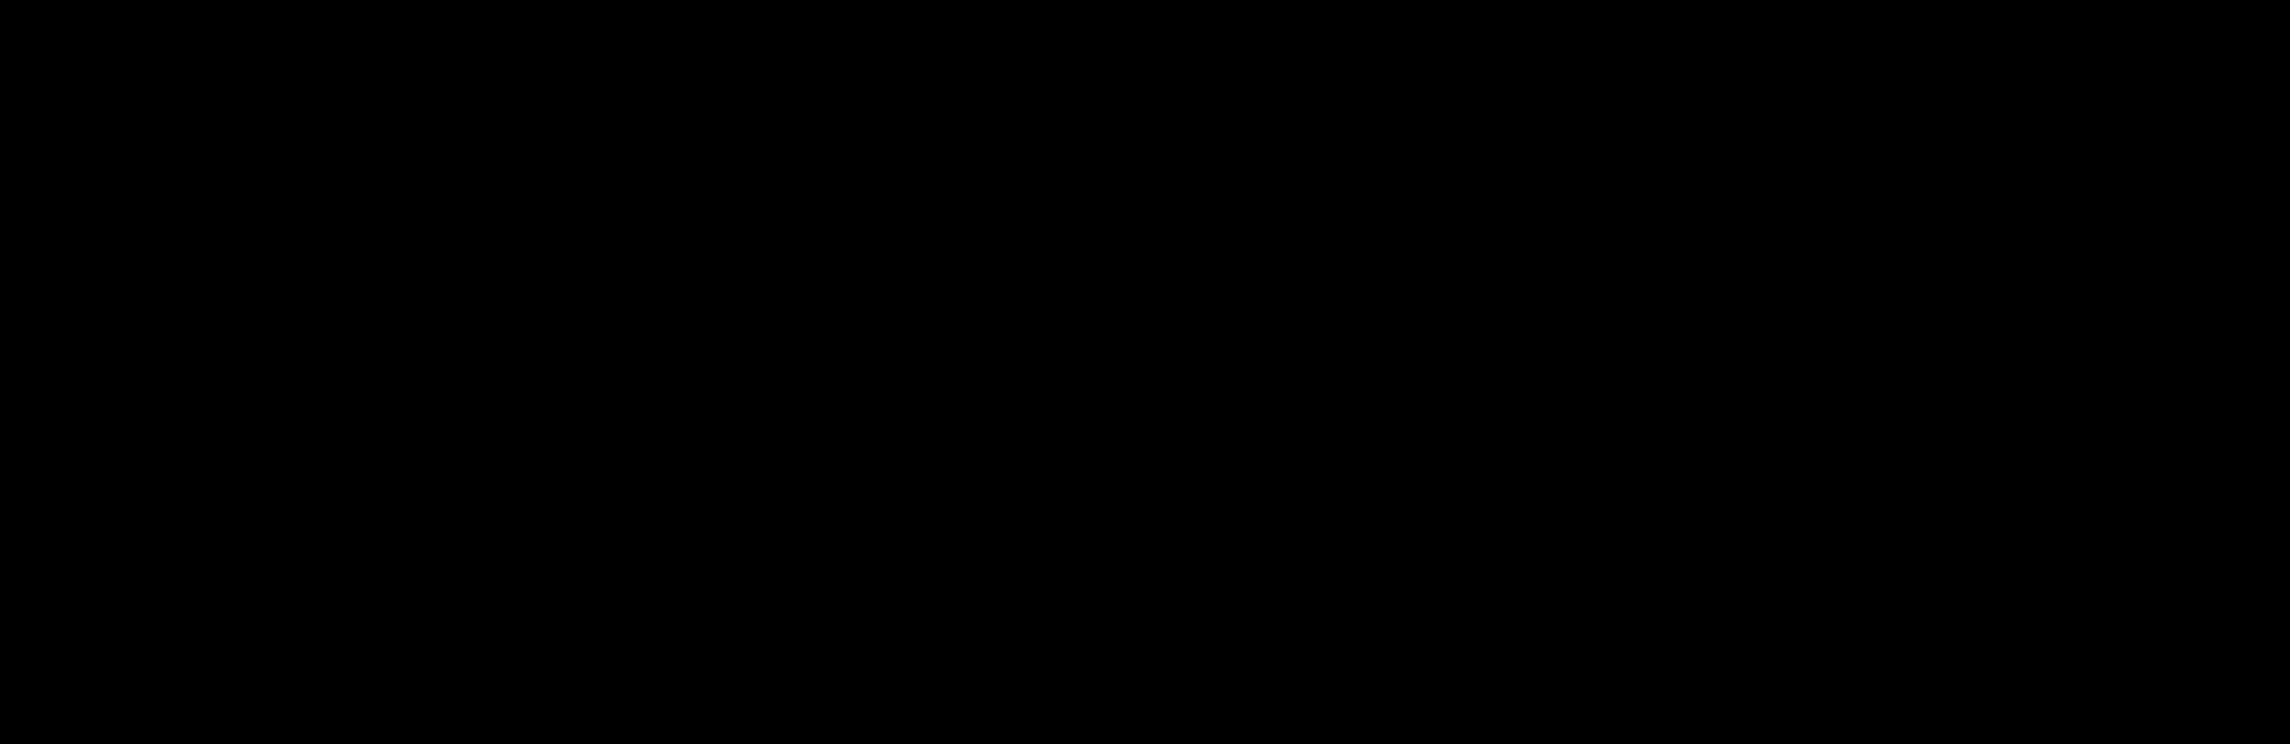 (E)-3-(4-hydroxy-3-methoxyphenyl)-N-(5-((1,2,3,4-tetrahydroacridin-9-yl)amino)pentyl)acrylamide